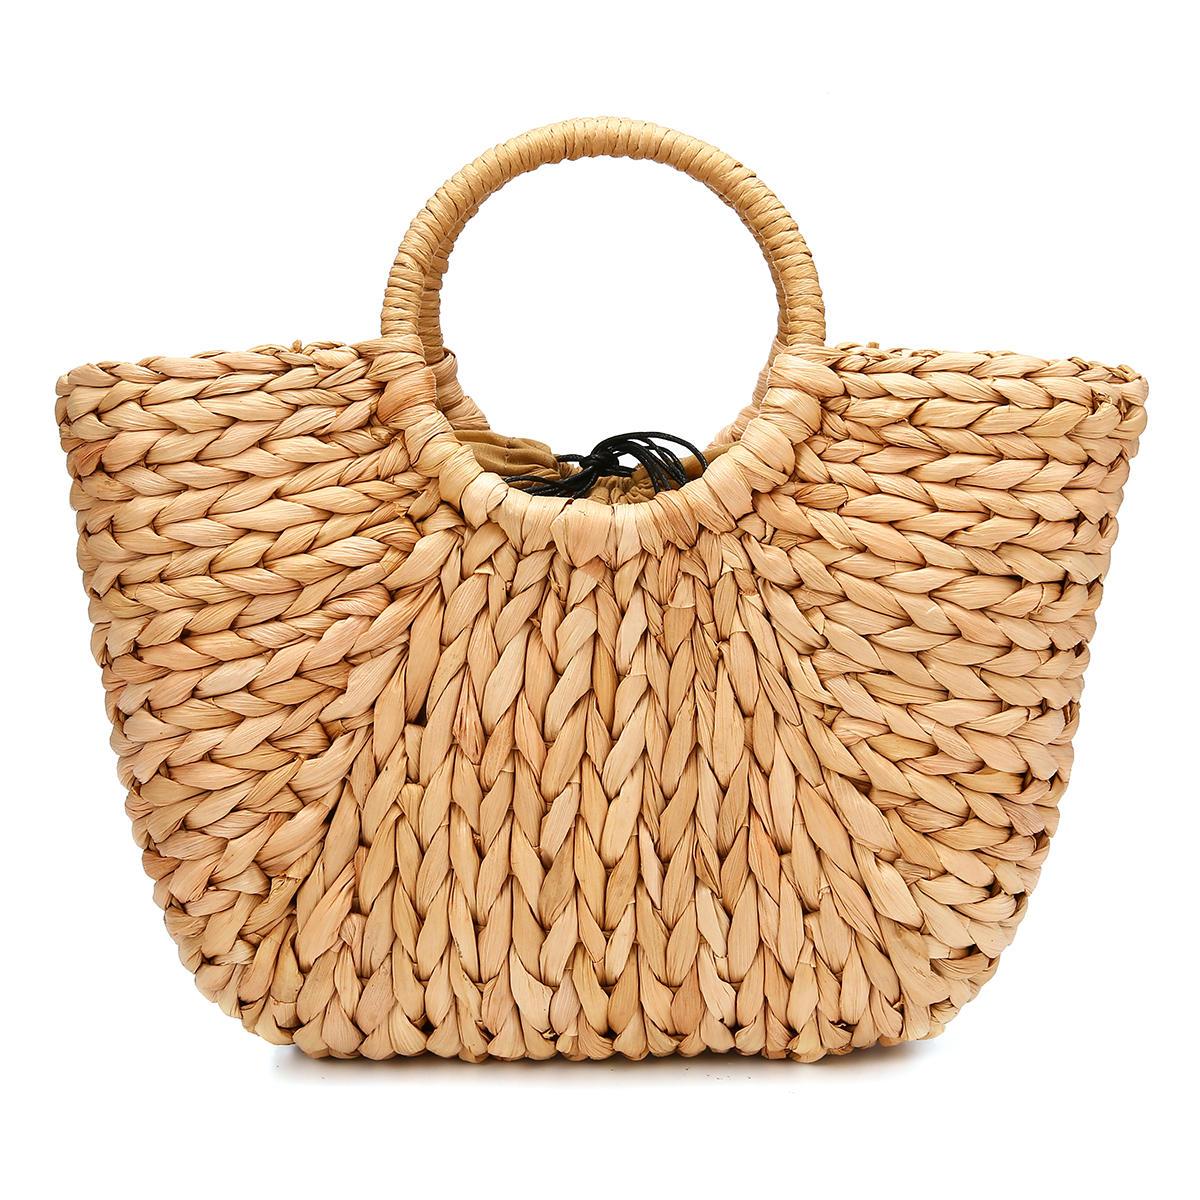 a9ba2cc5a7d7 JOSEKO Straw Bag Women Summer Rattan Bag Handmade Woven Circle Bohemia  Beach Handbag